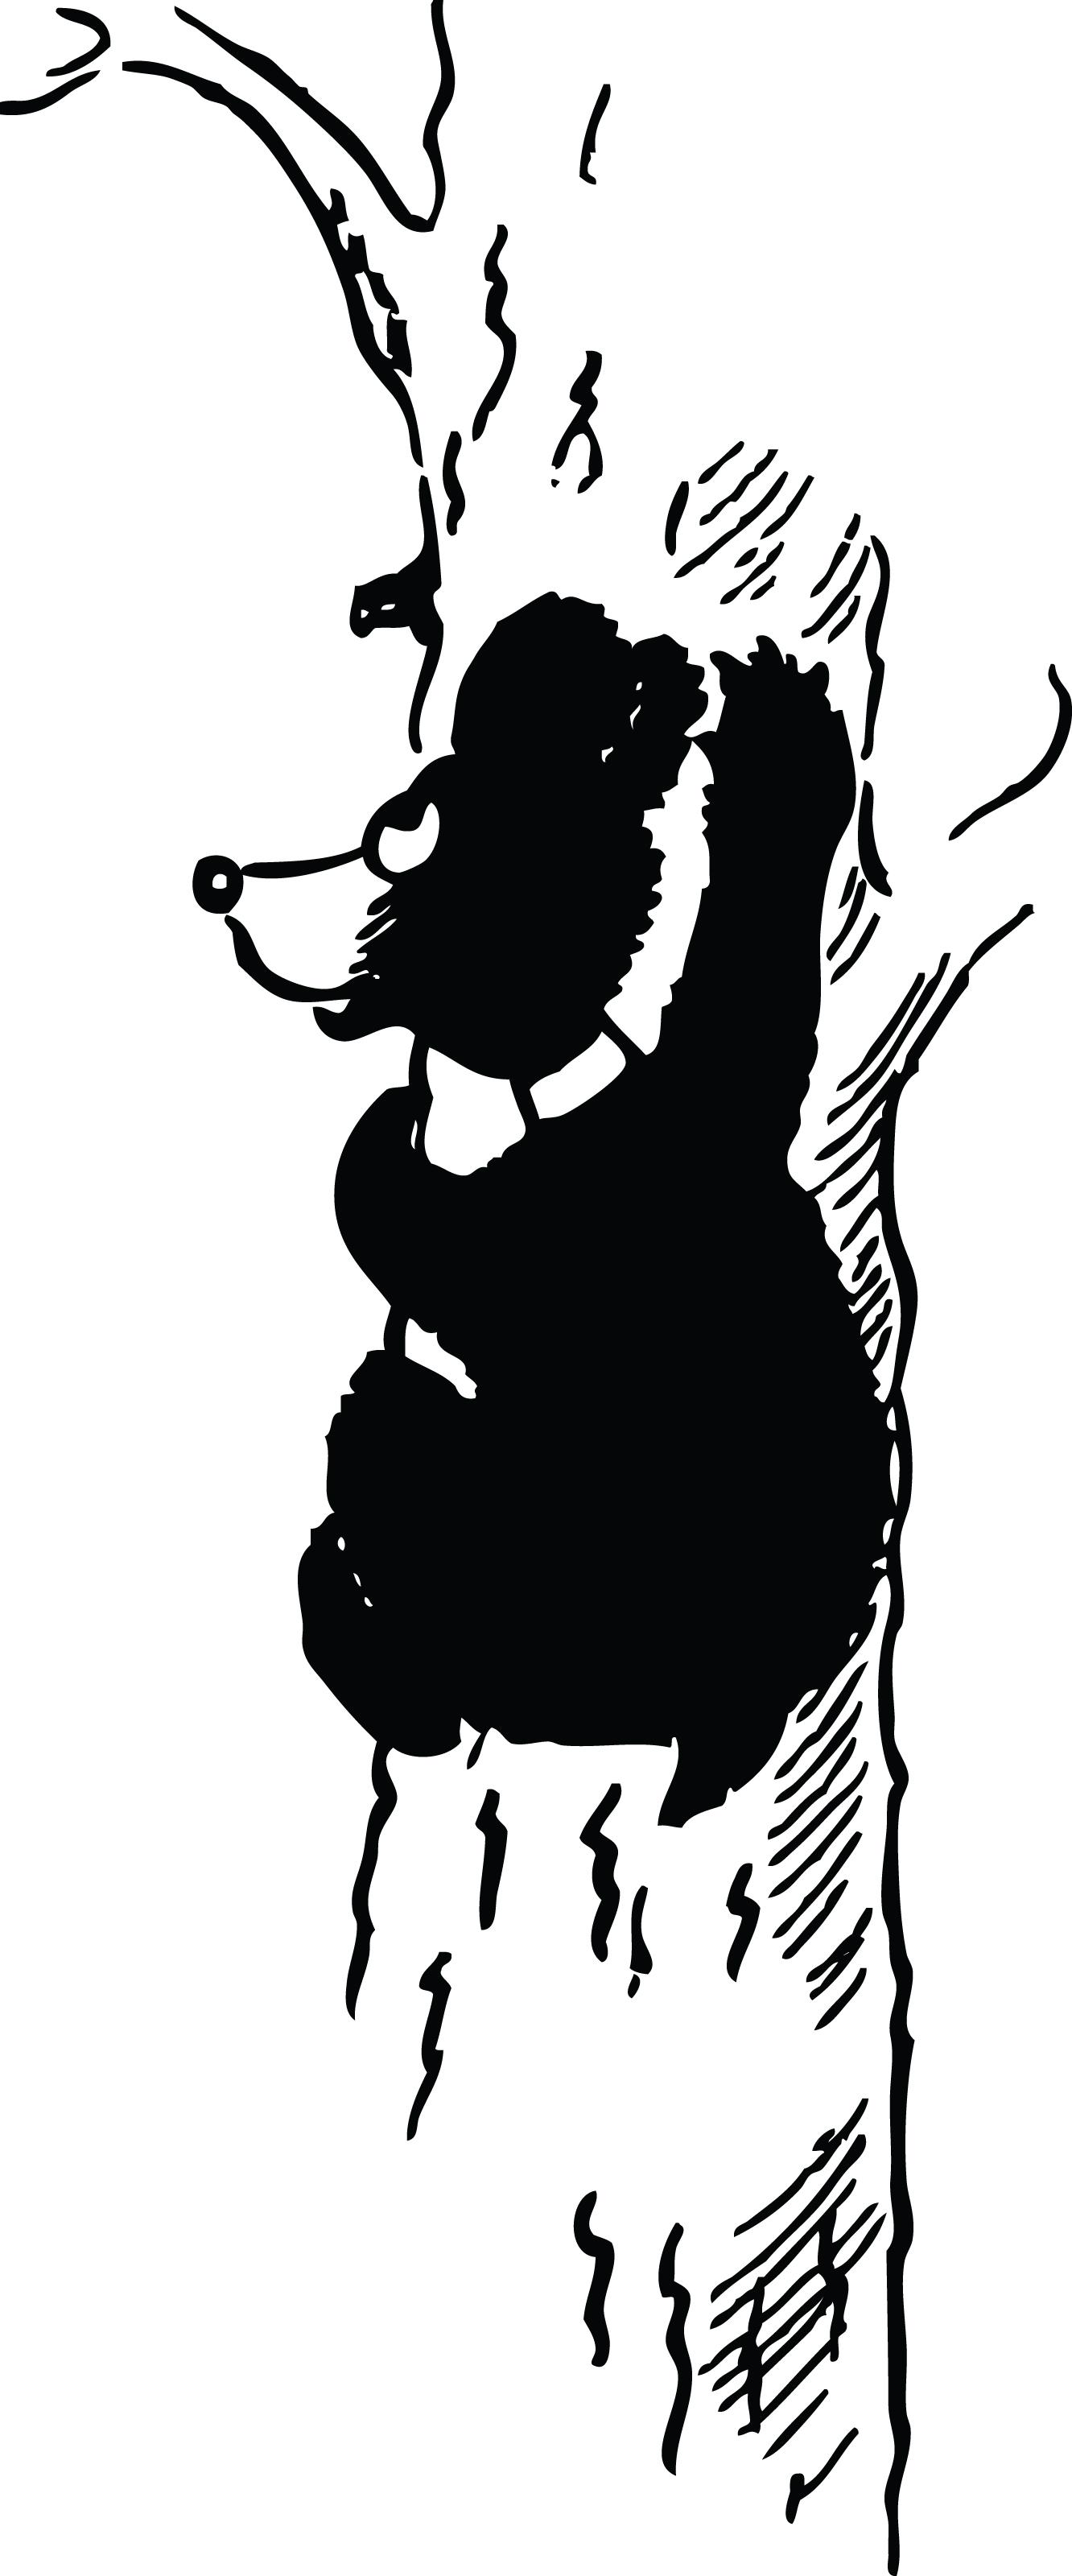 659 Black Bear free clipart.